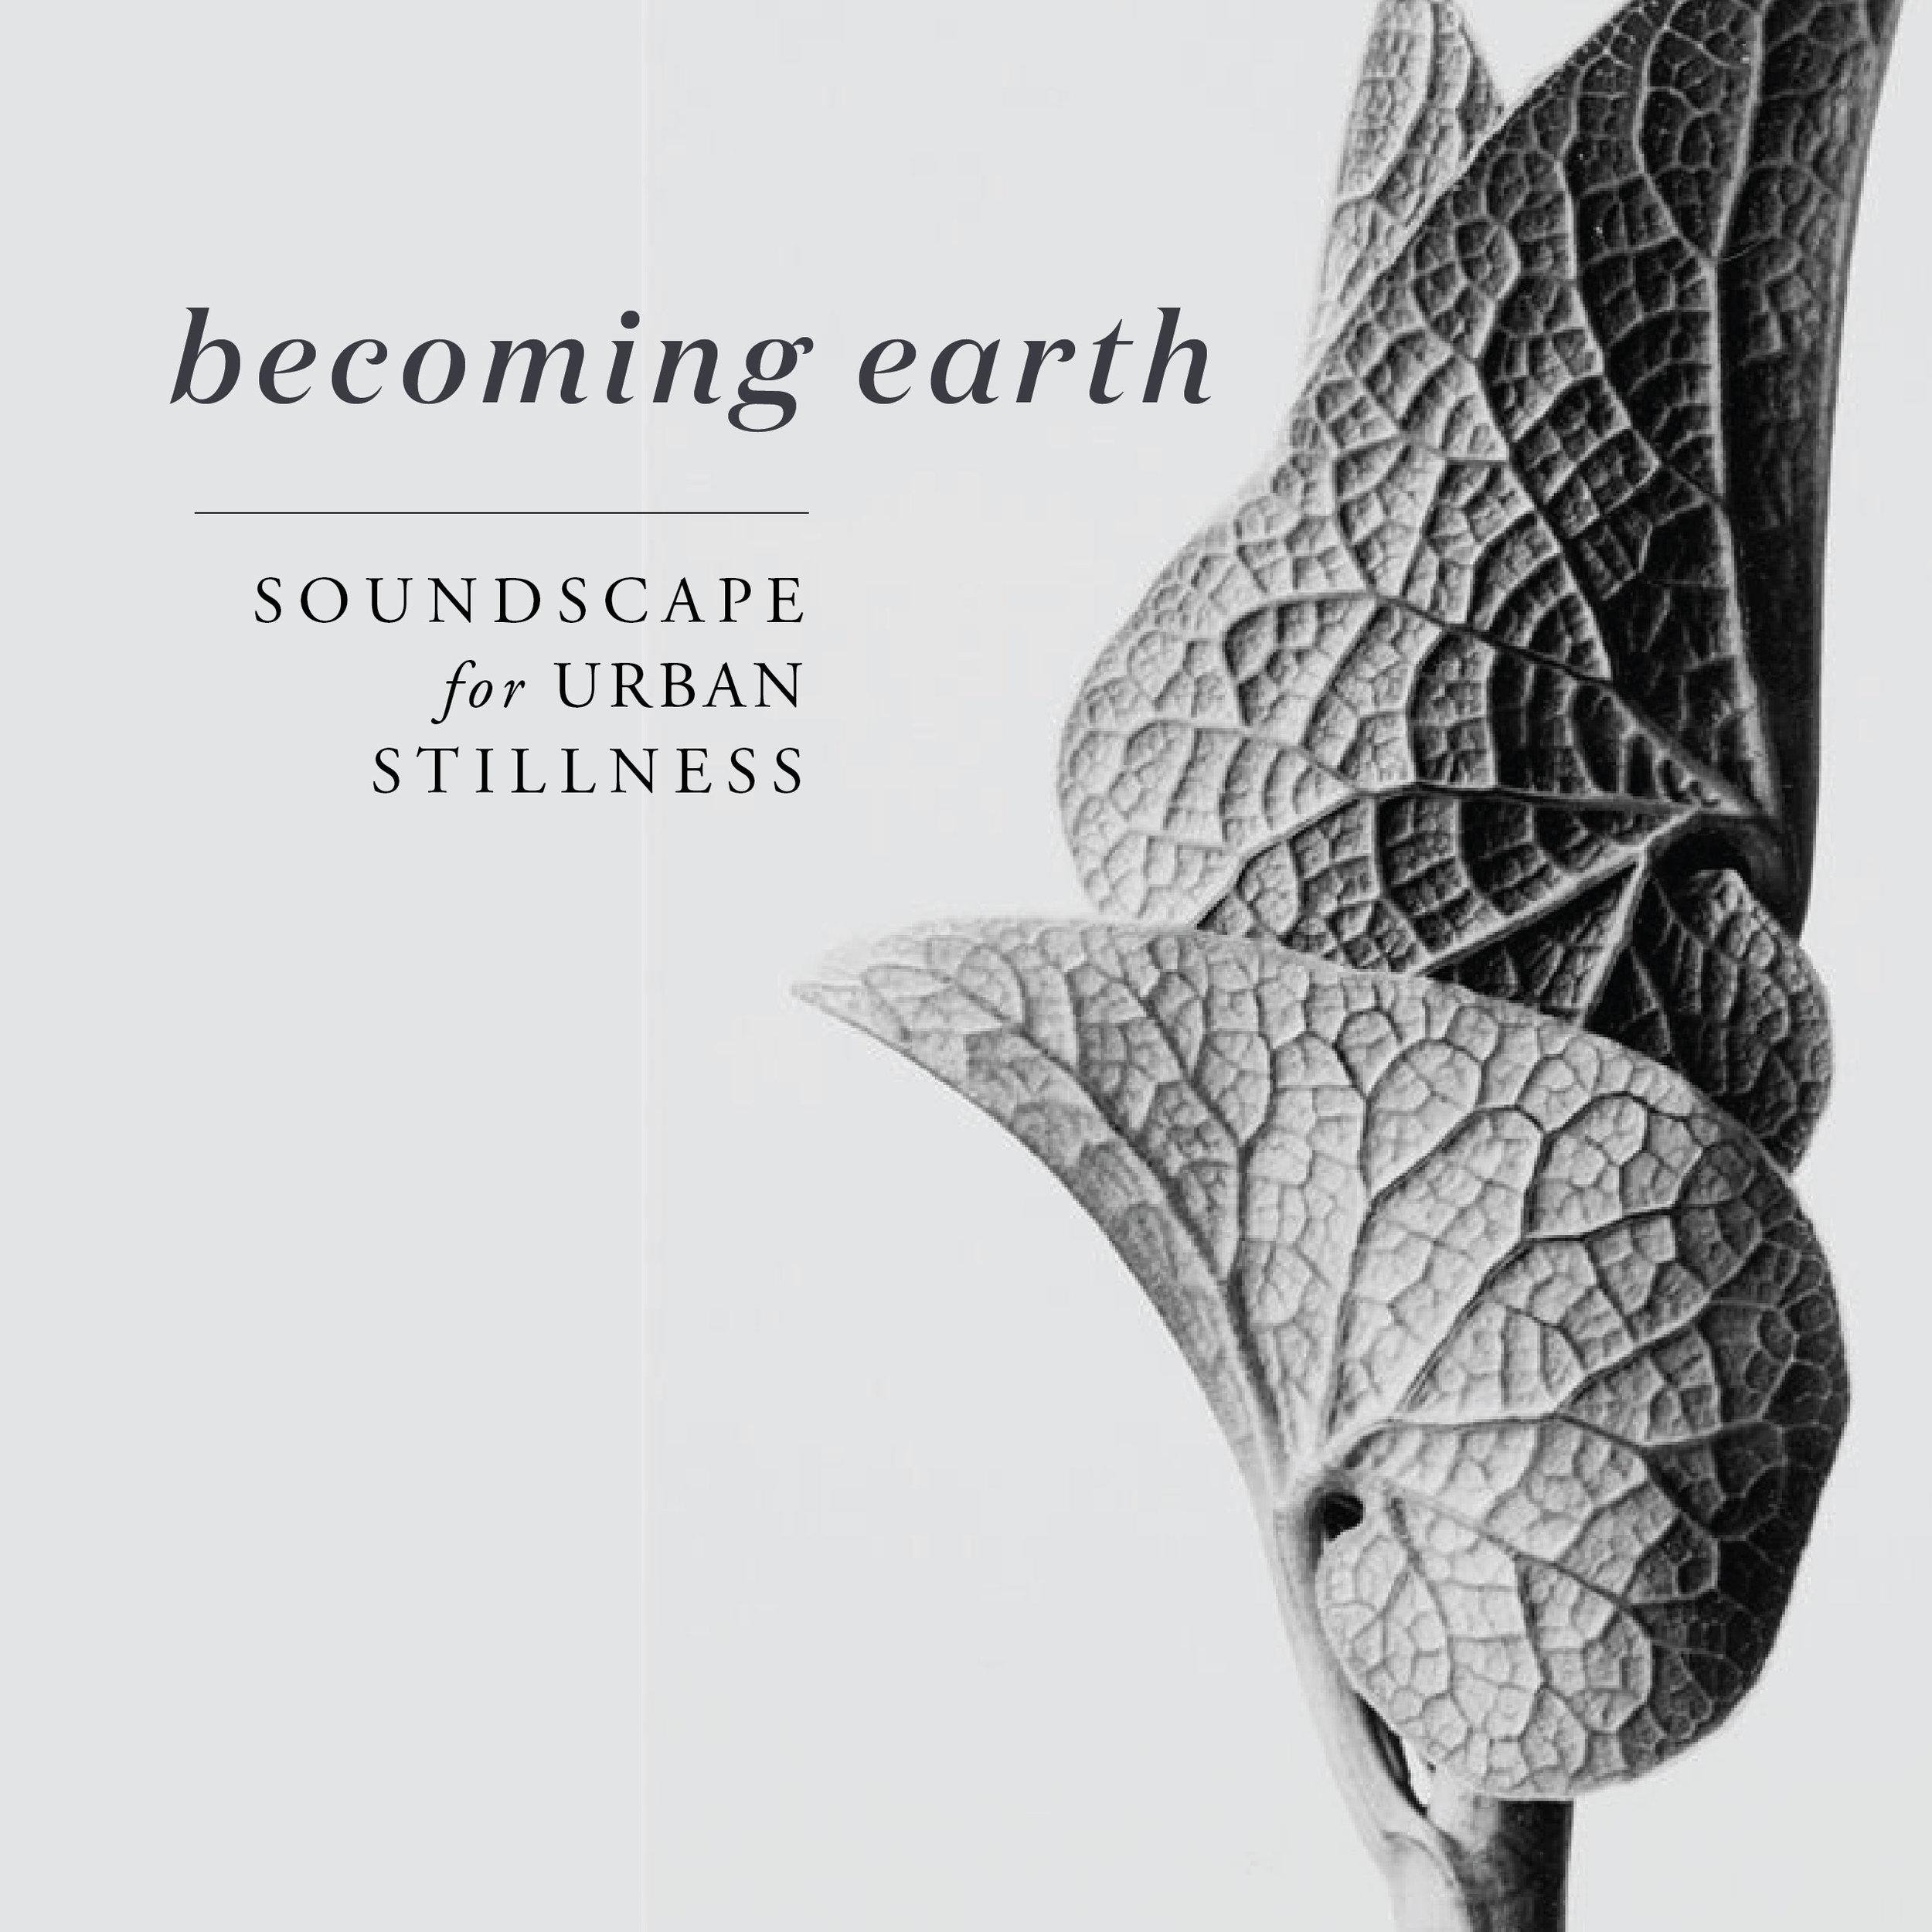 Becoming Earth-02-02.jpg